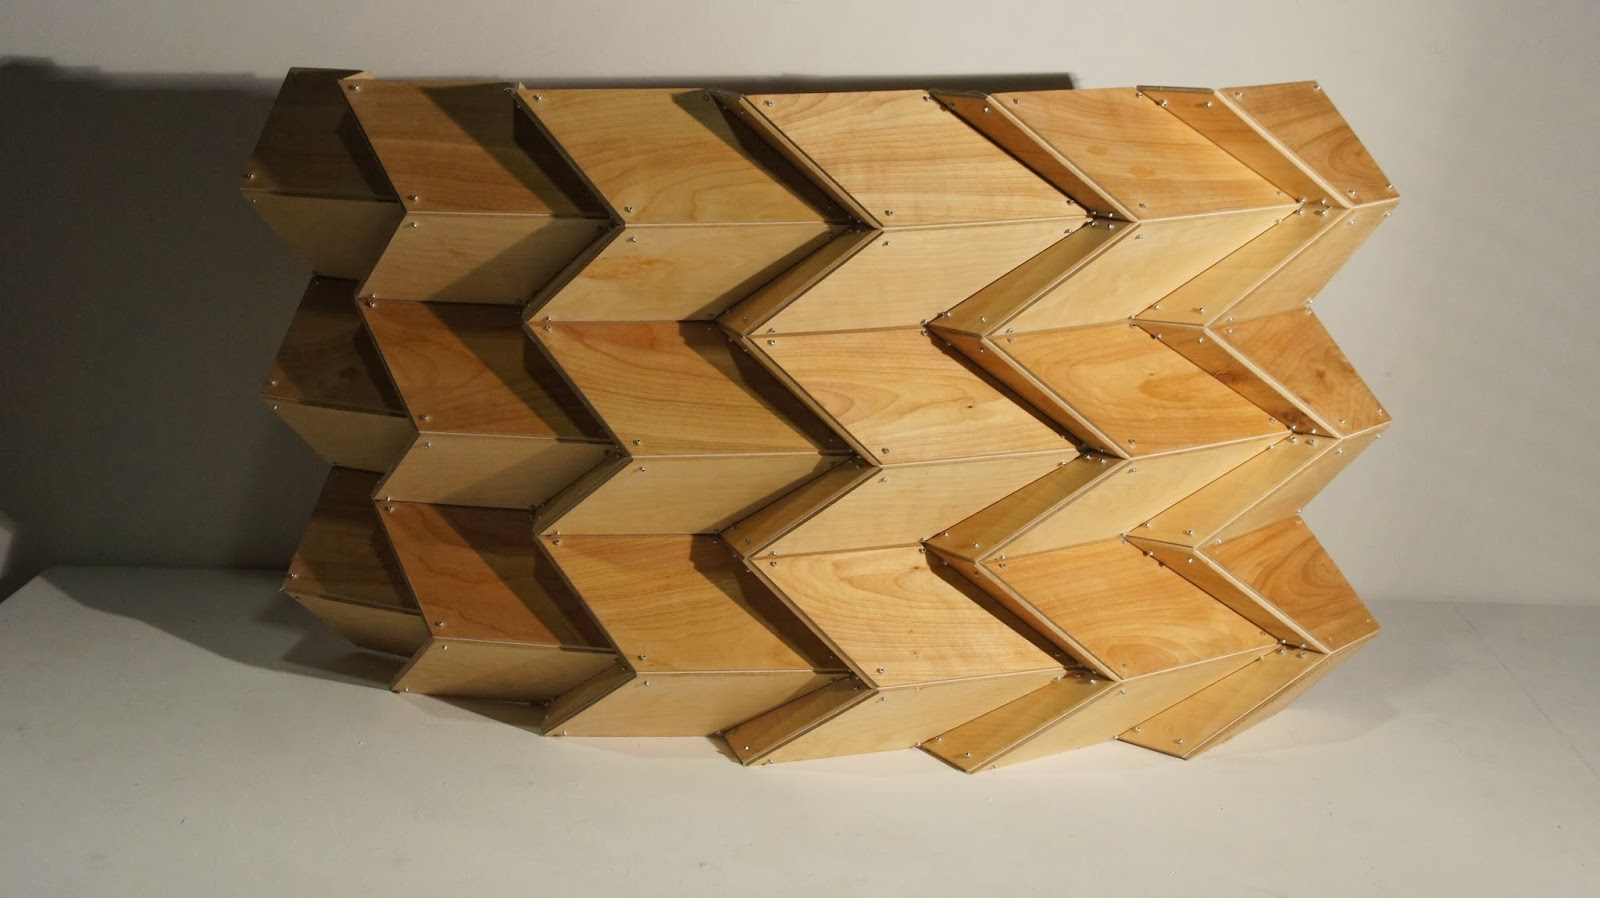 Rigid Folding Structures: V-Pleat Miura-ori Rigid Plate ... - photo#10